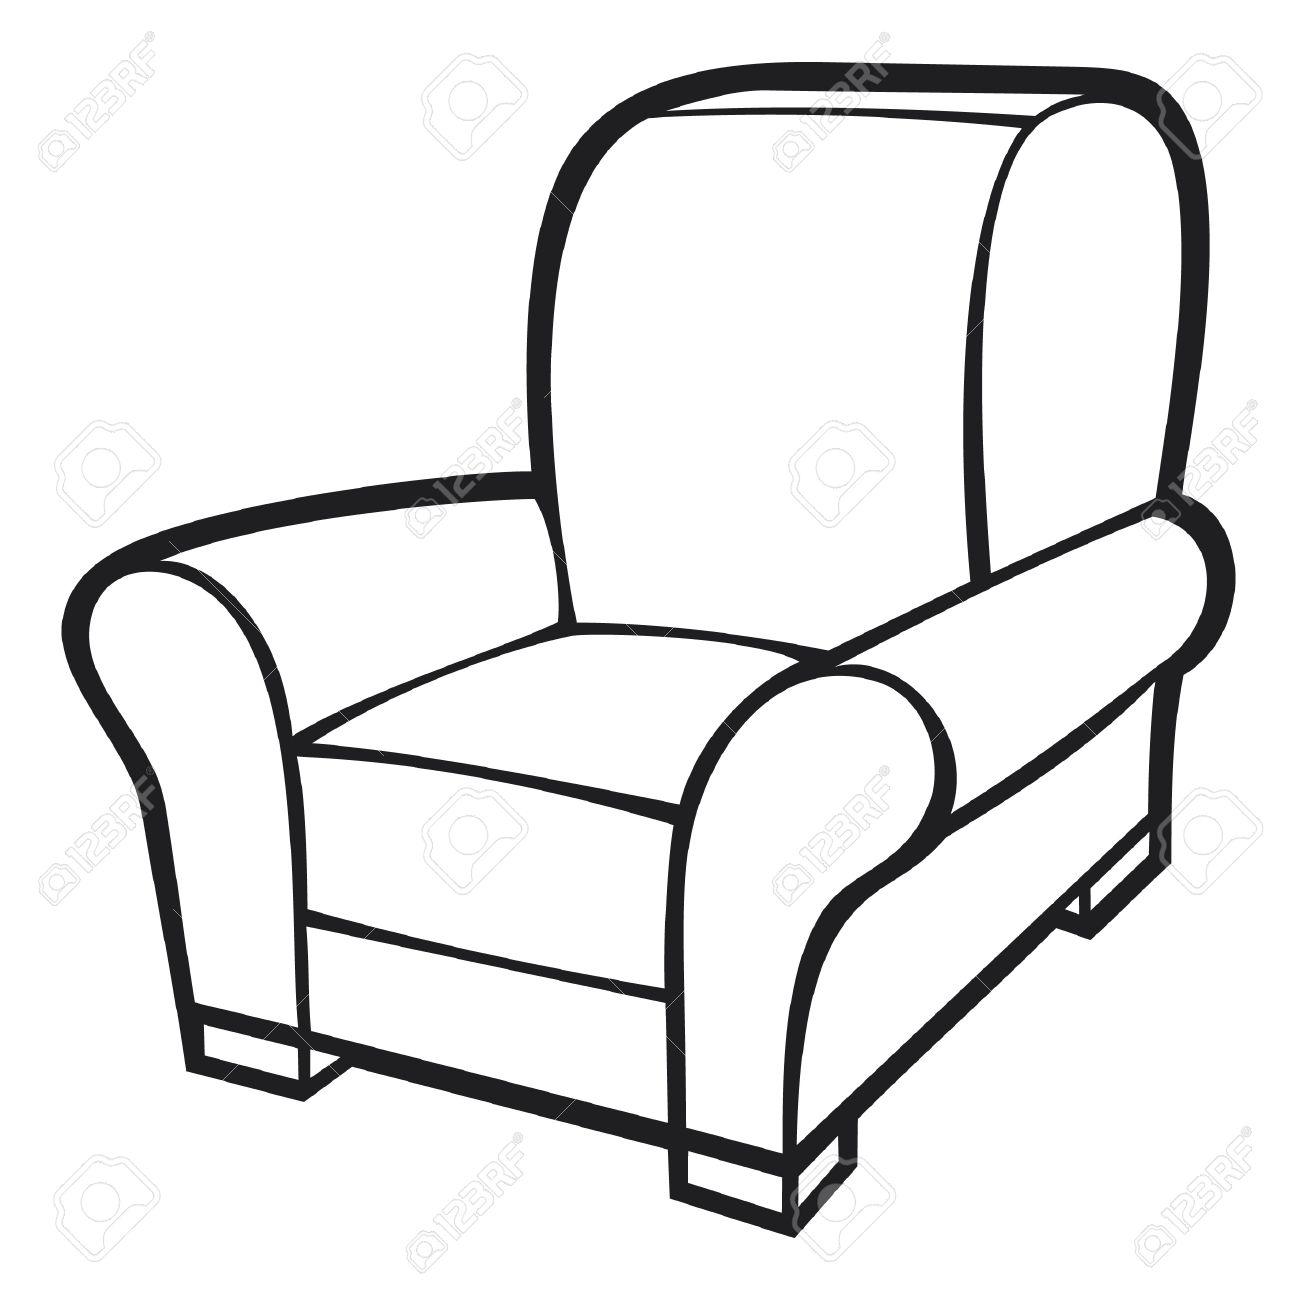 Chair clipart black and white. Clip art panda free